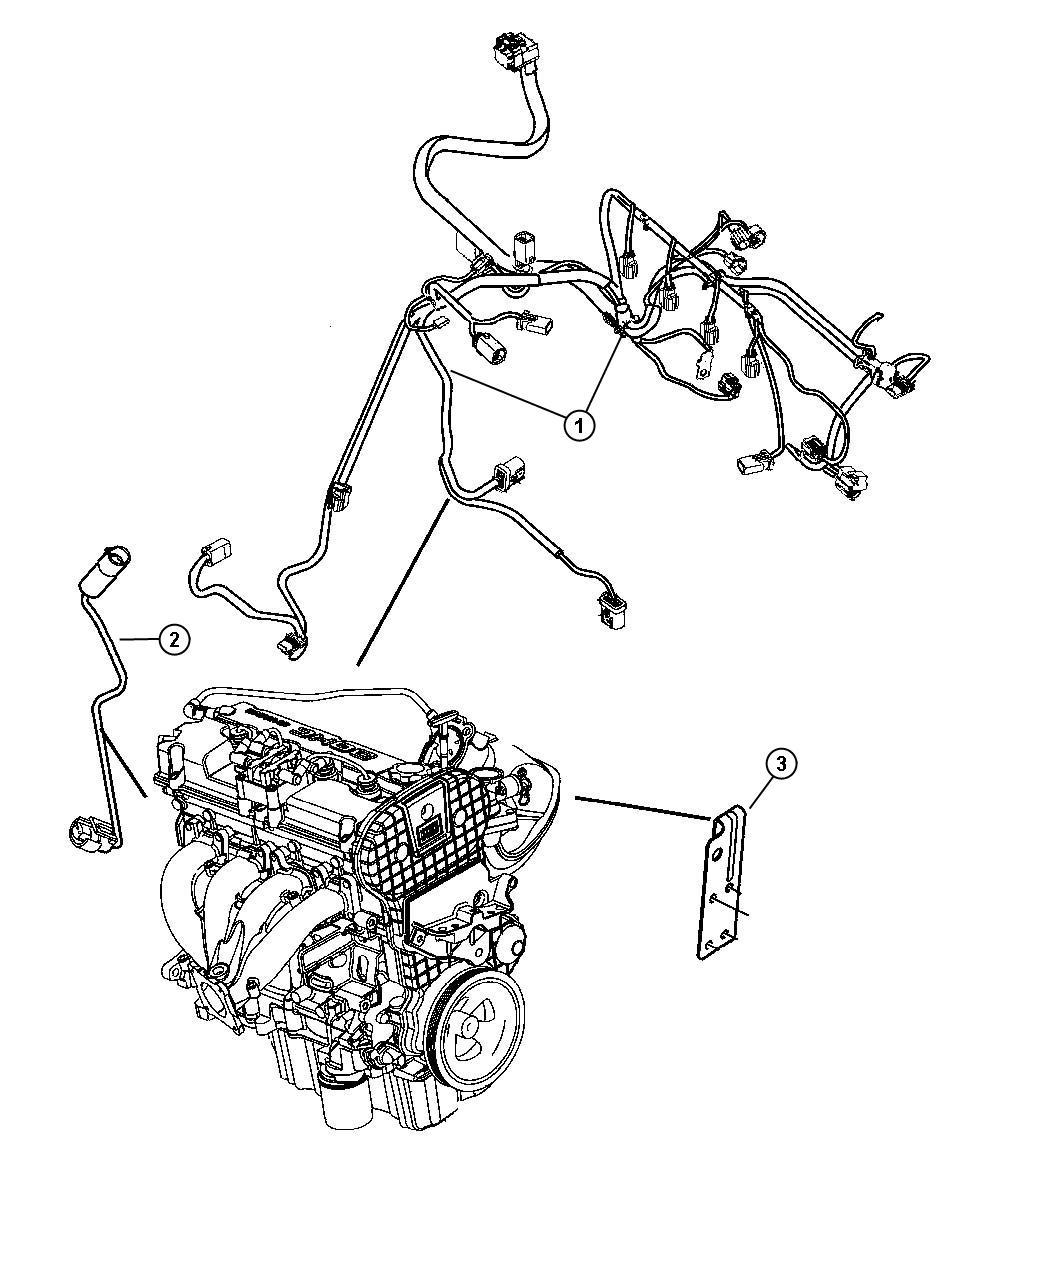 Chrysler Sebring Wiring. Transmission - 04801320AE | Mopar ...